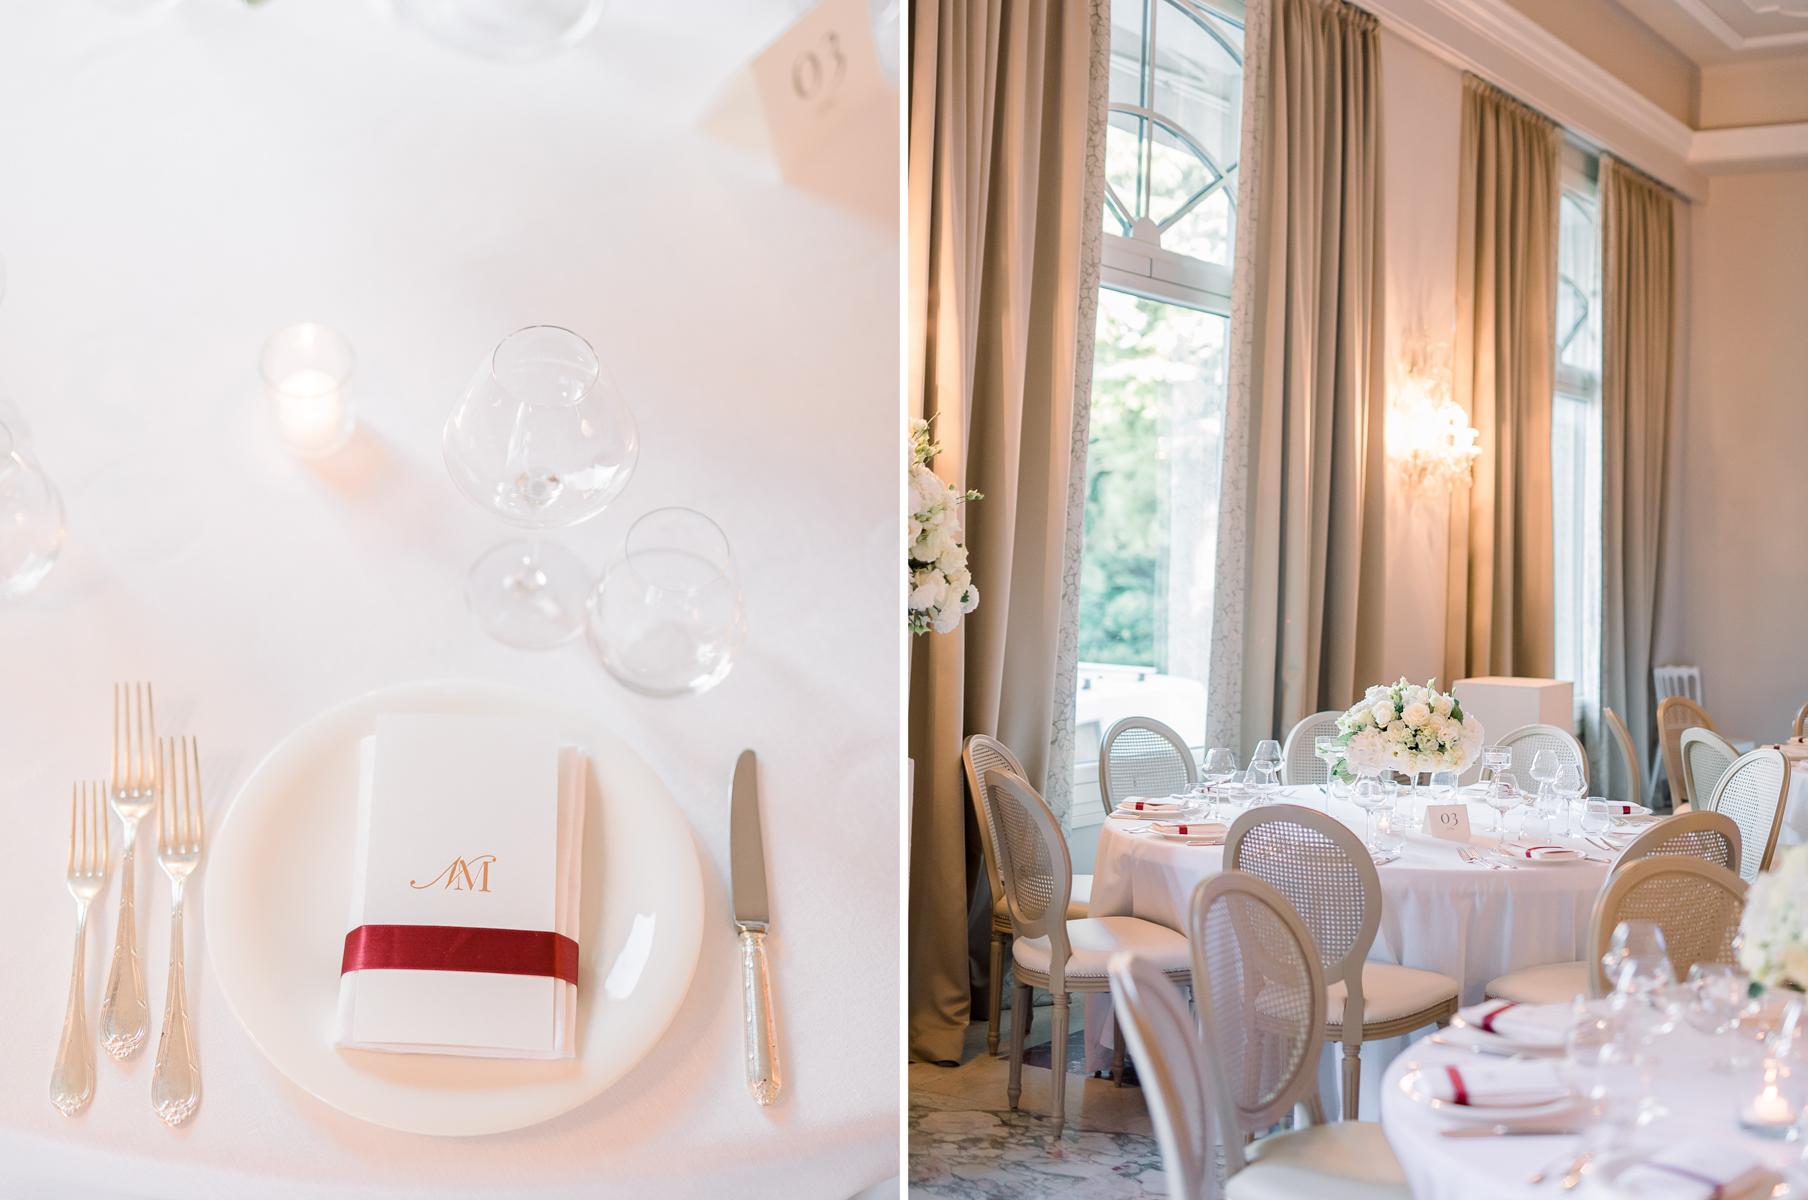 Palace_Villa_Cortine_Hotel_Italian_Wedding_Photographer_Sirmione_AKP-40.jpg